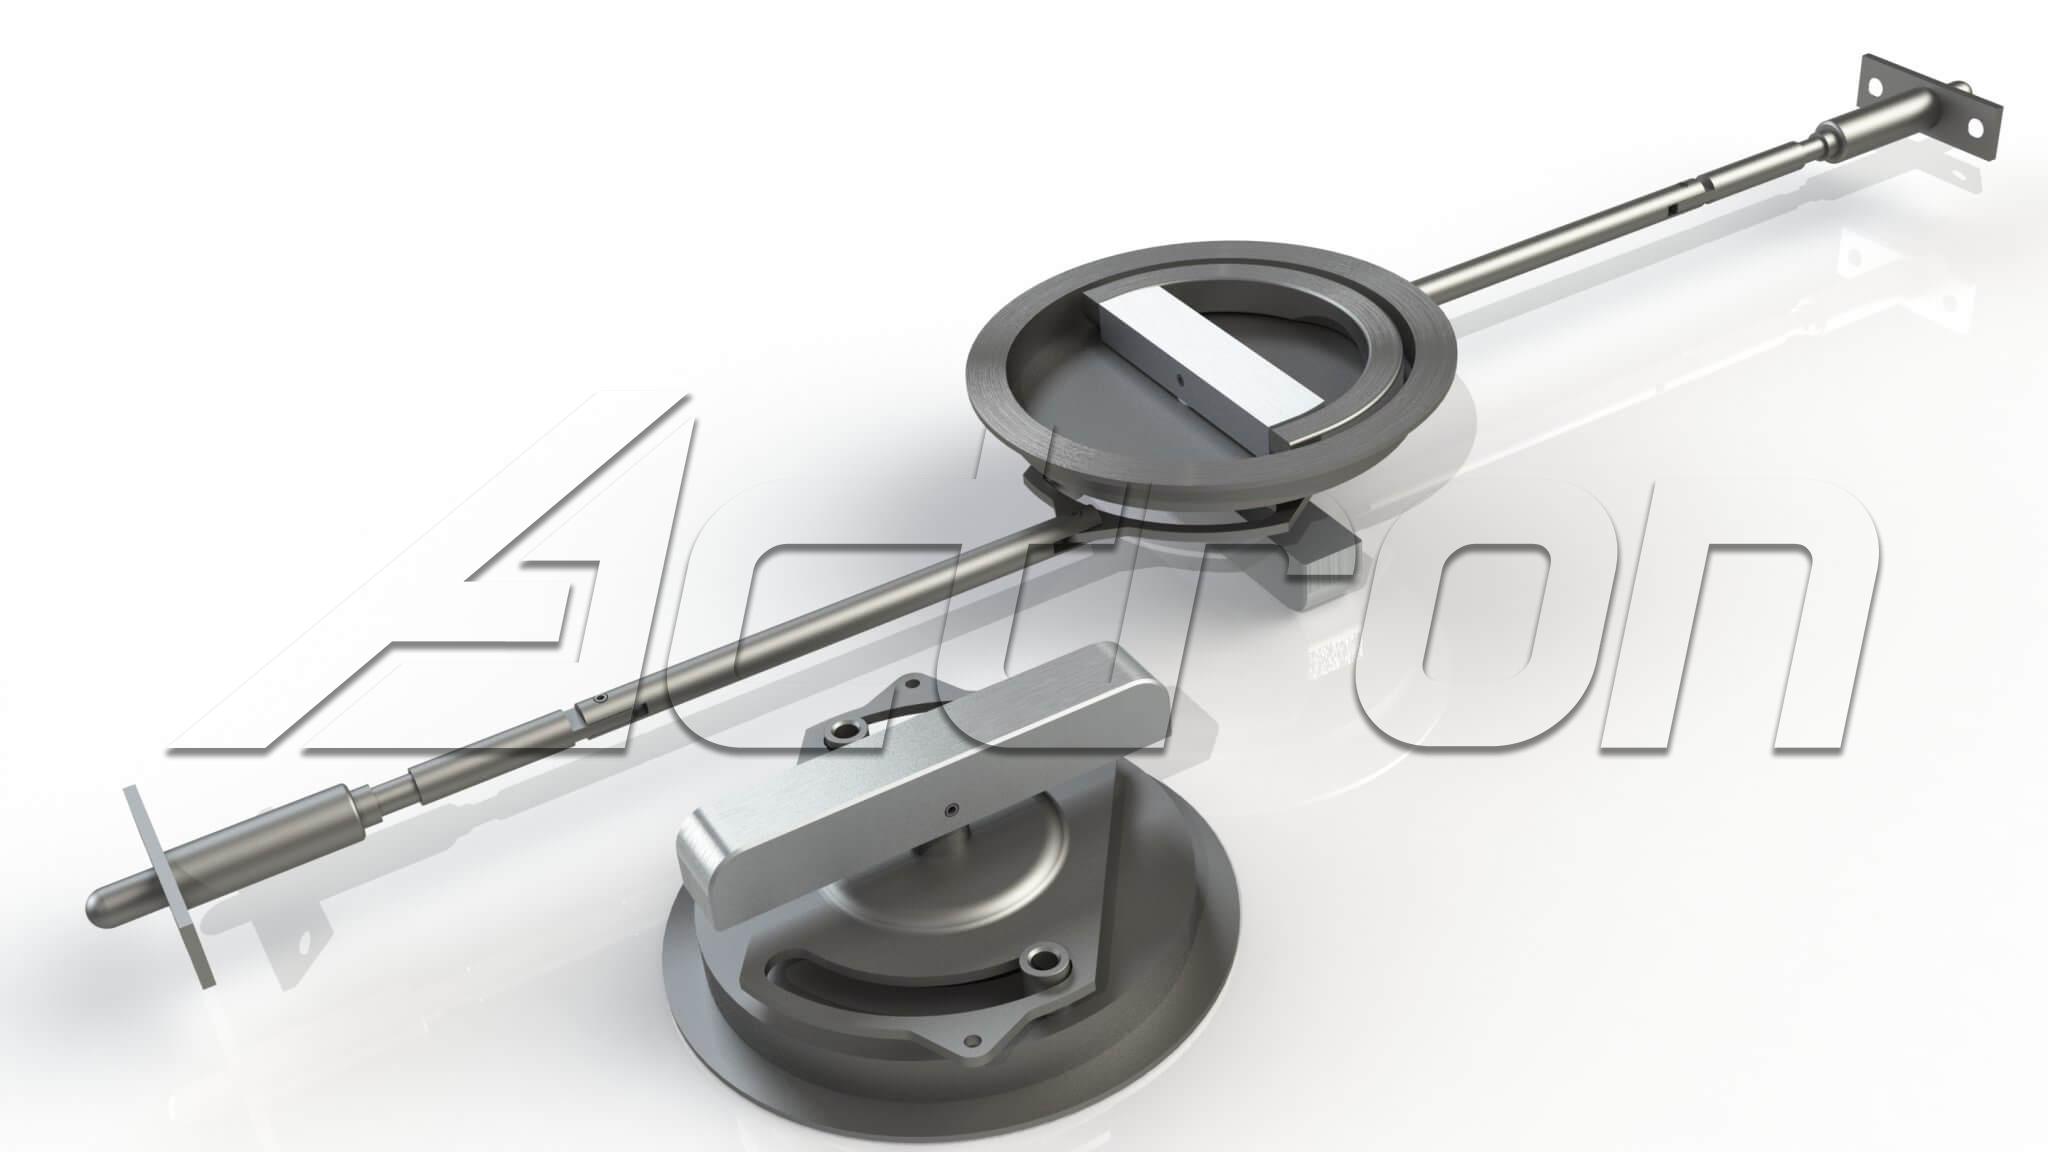 door-bolting-system-8211-d-handle-4482-a39103.jpg